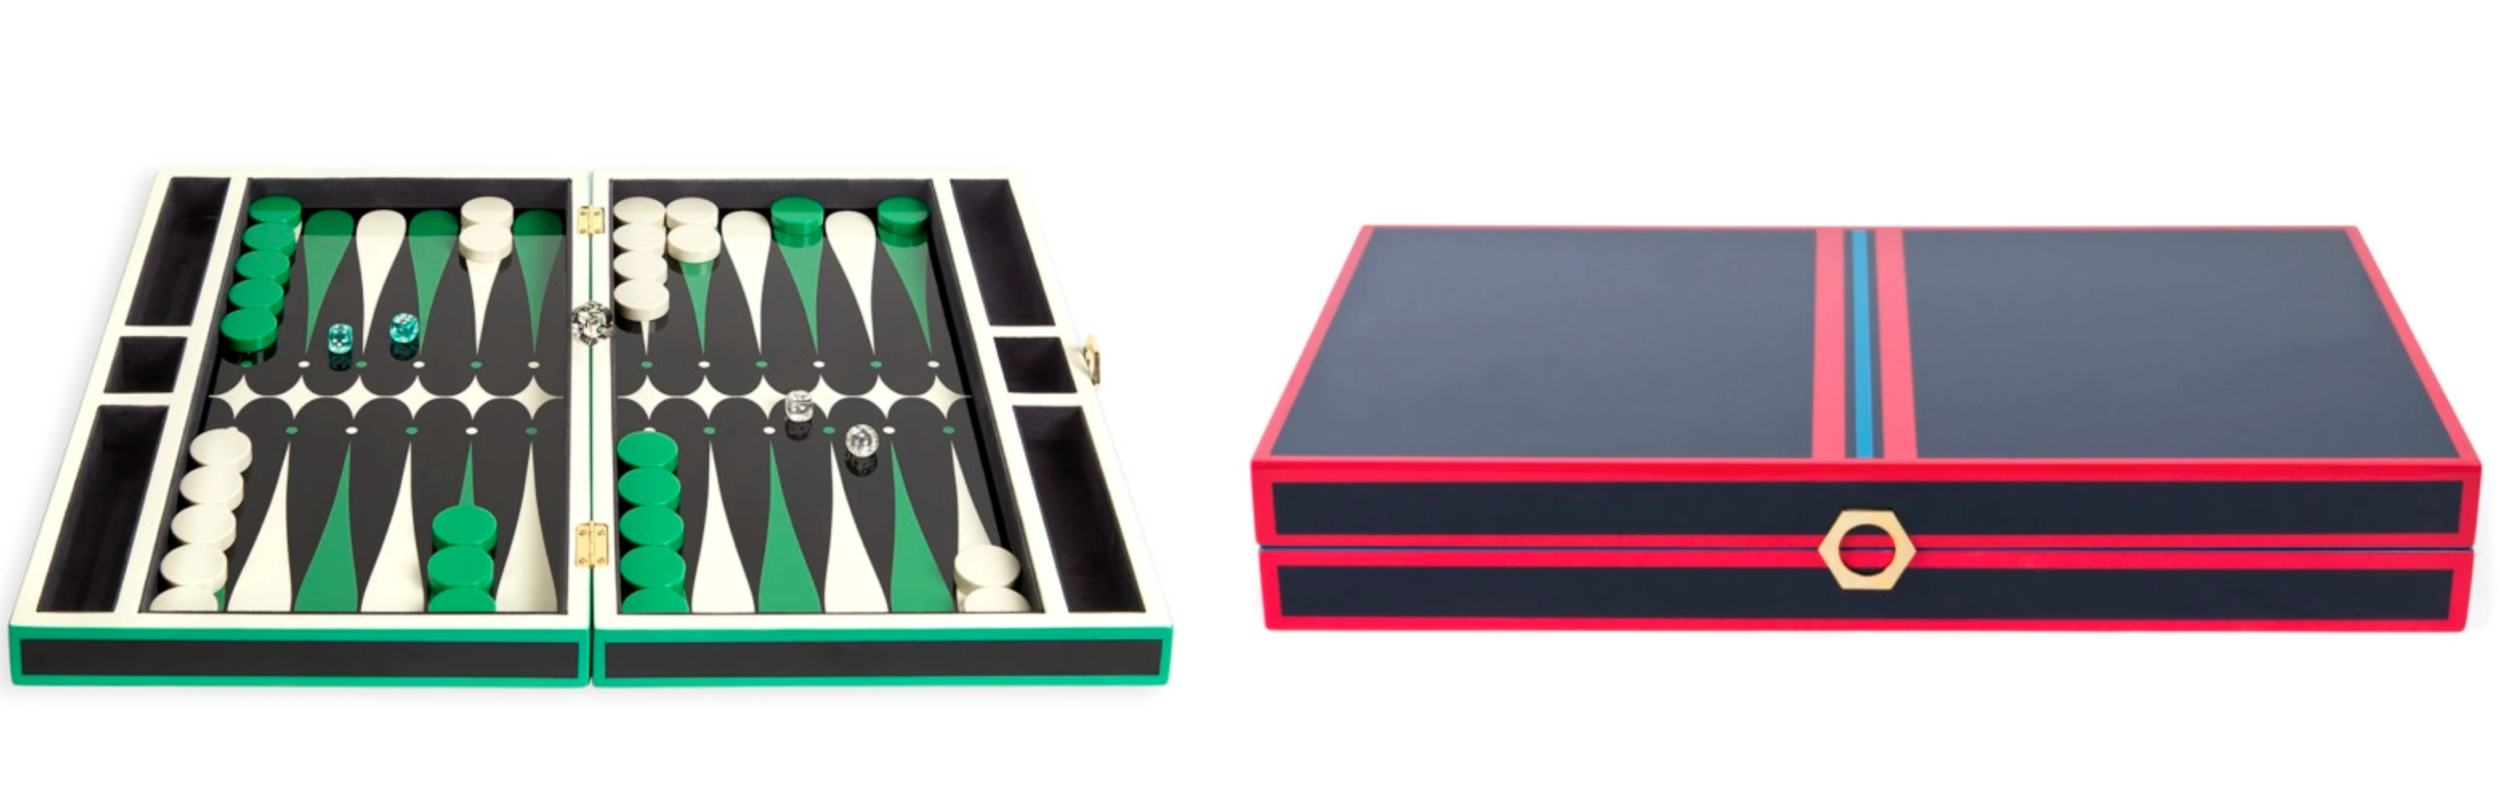 www.notanotherbill.com/product/backgammon-set